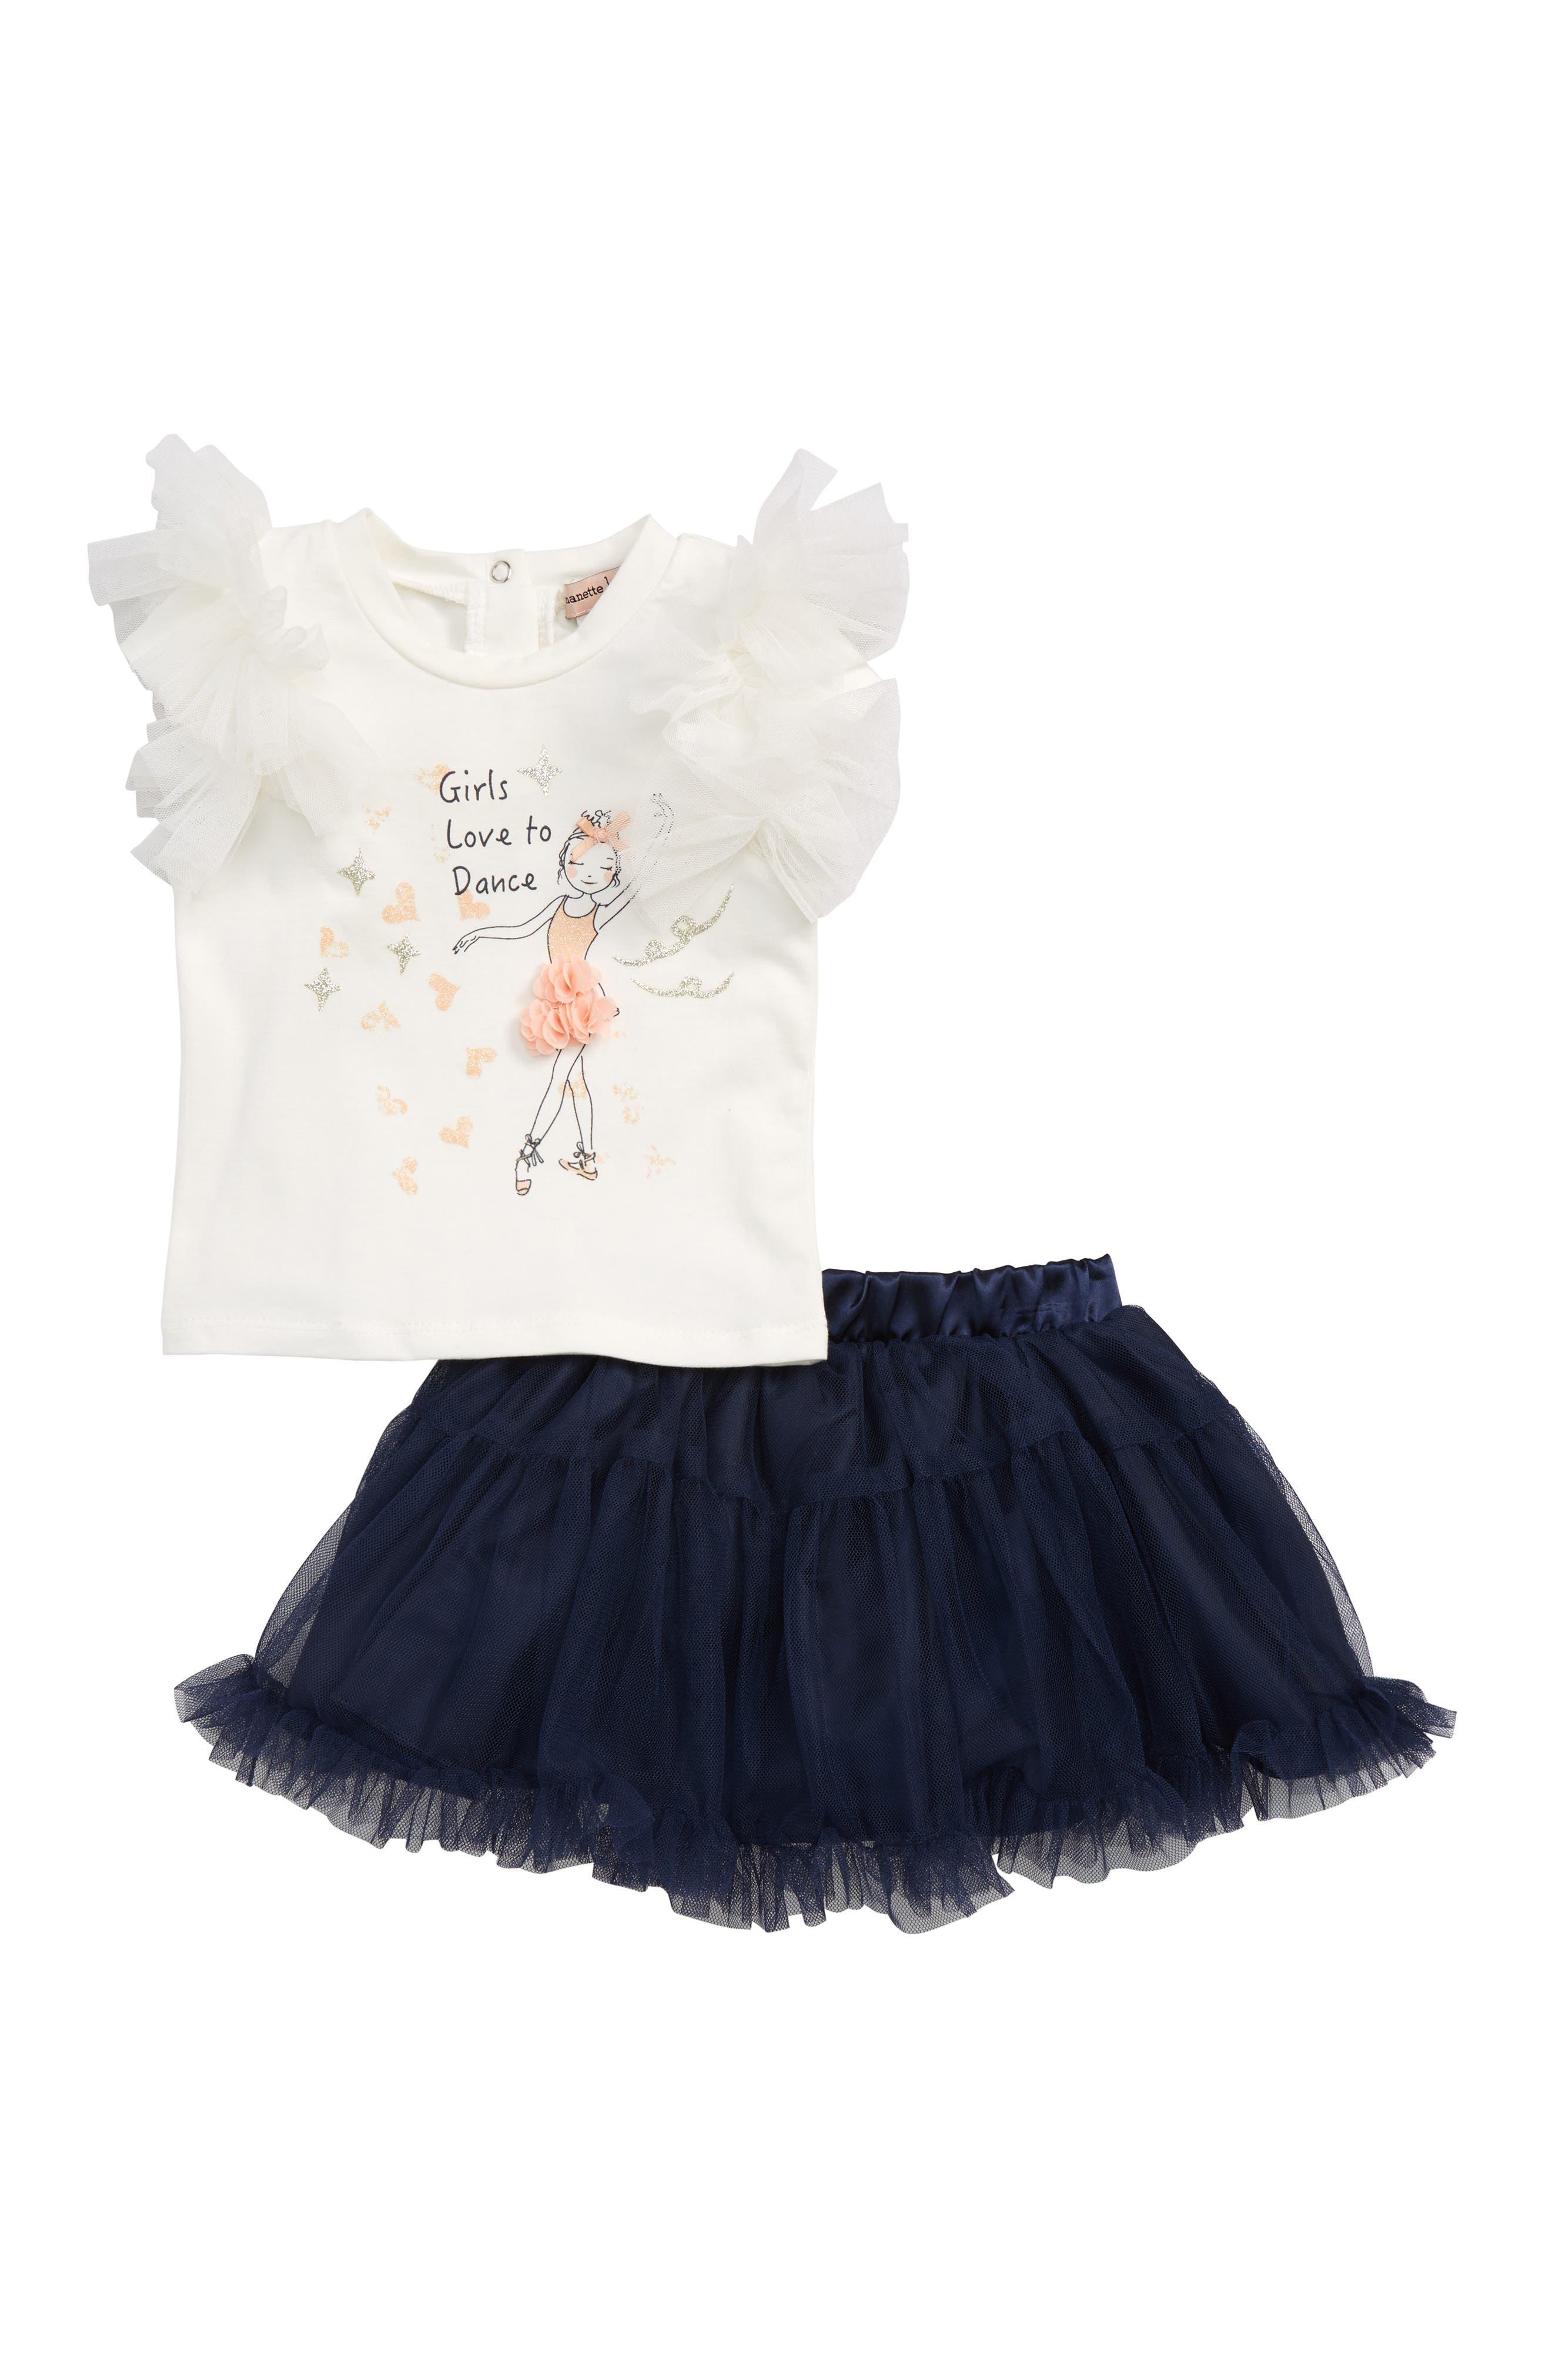 Ballerina Top & Skirt Set,                             Main thumbnail 1, color,                             410